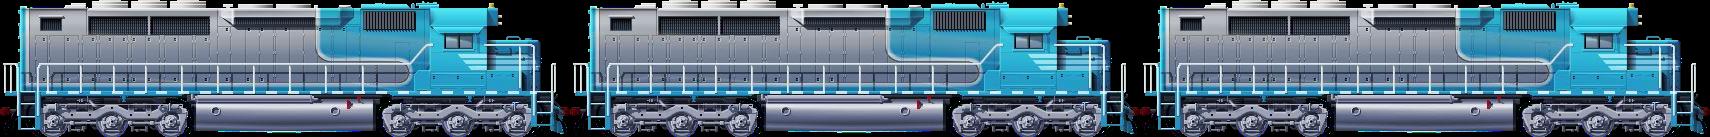 EMD SDP40 Triple